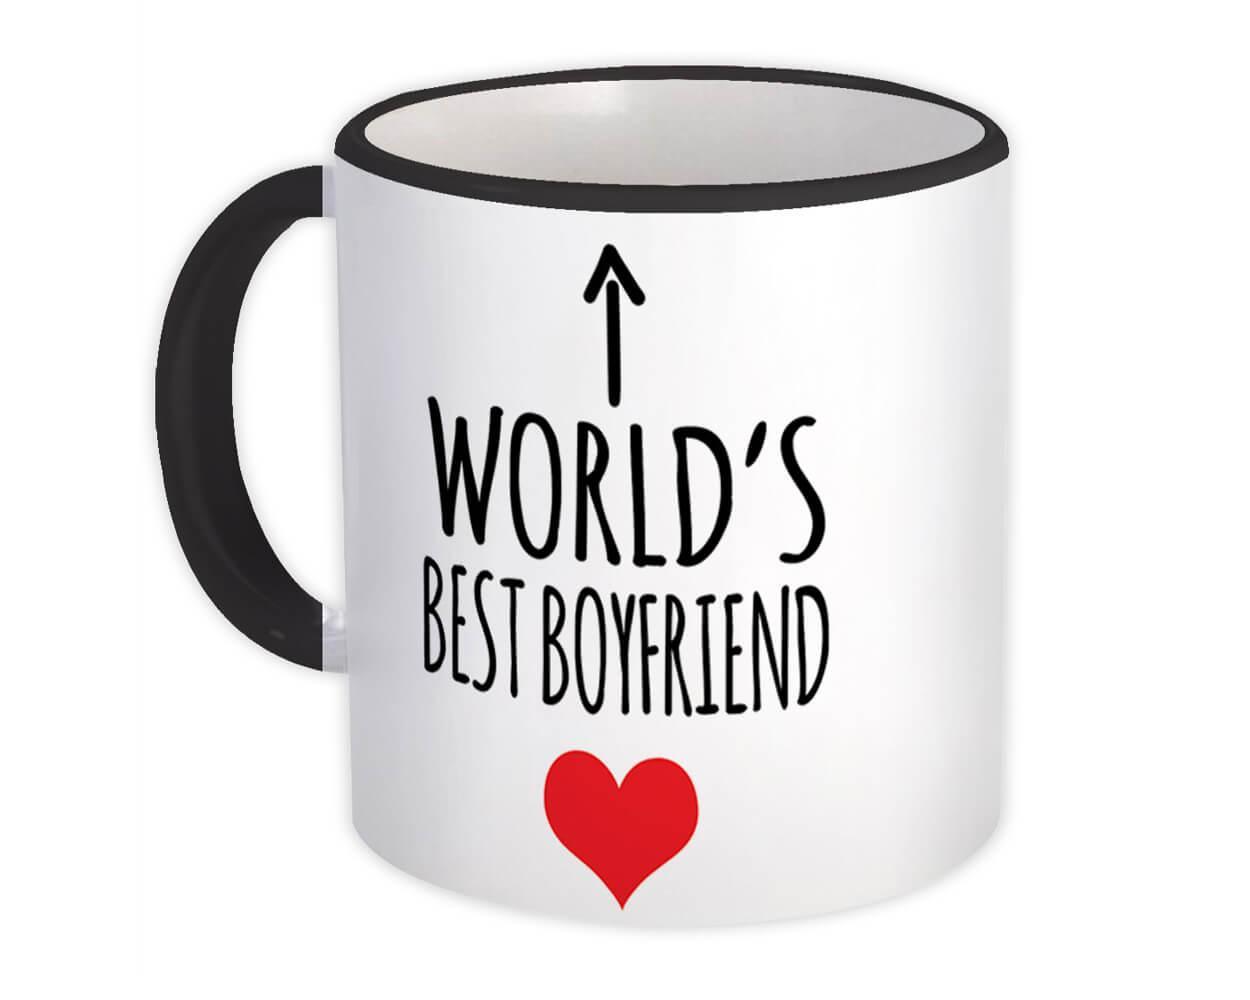 Worlds Best BOYFRIEND : Gift Mug Heart Love Family Work Christmas Birthday